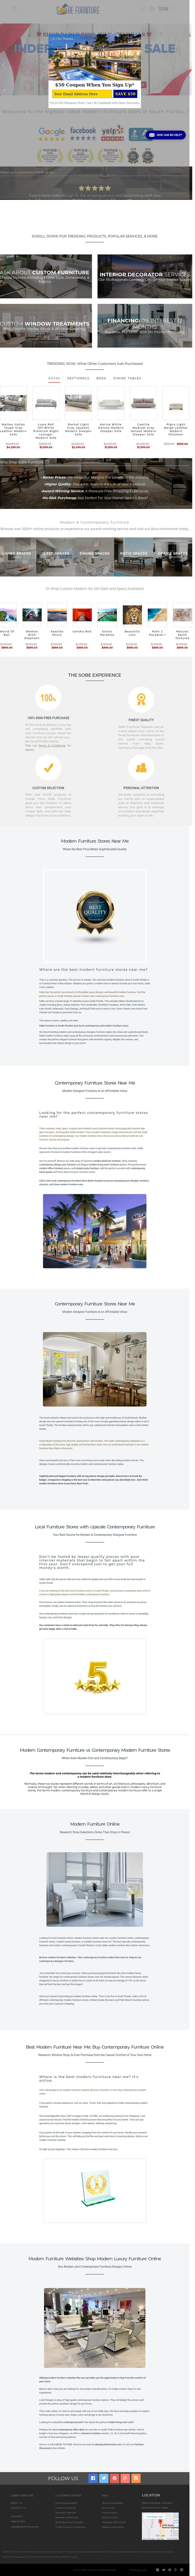 Sobe Furnitureu0027s Website Screenshot On Jun 2018